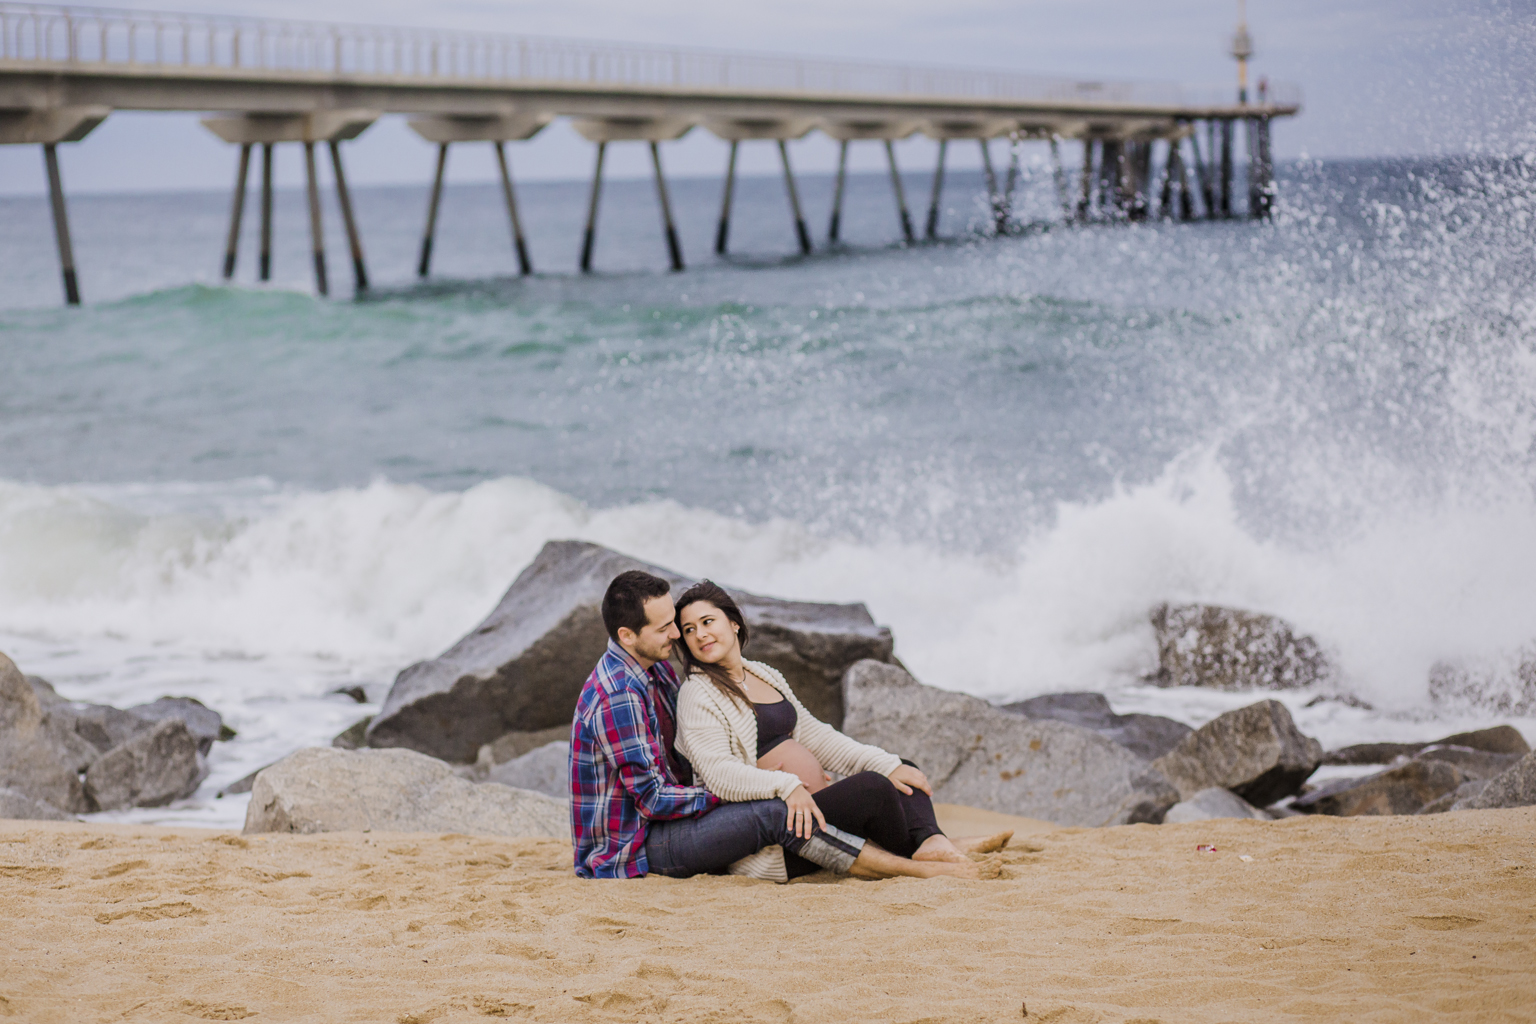 fotógrafo de embarazo badalona :: fotógrafo de embarazo barcelona :: fotografía embarazada en la playa :: fotótgrafo embarazada pont del petroli